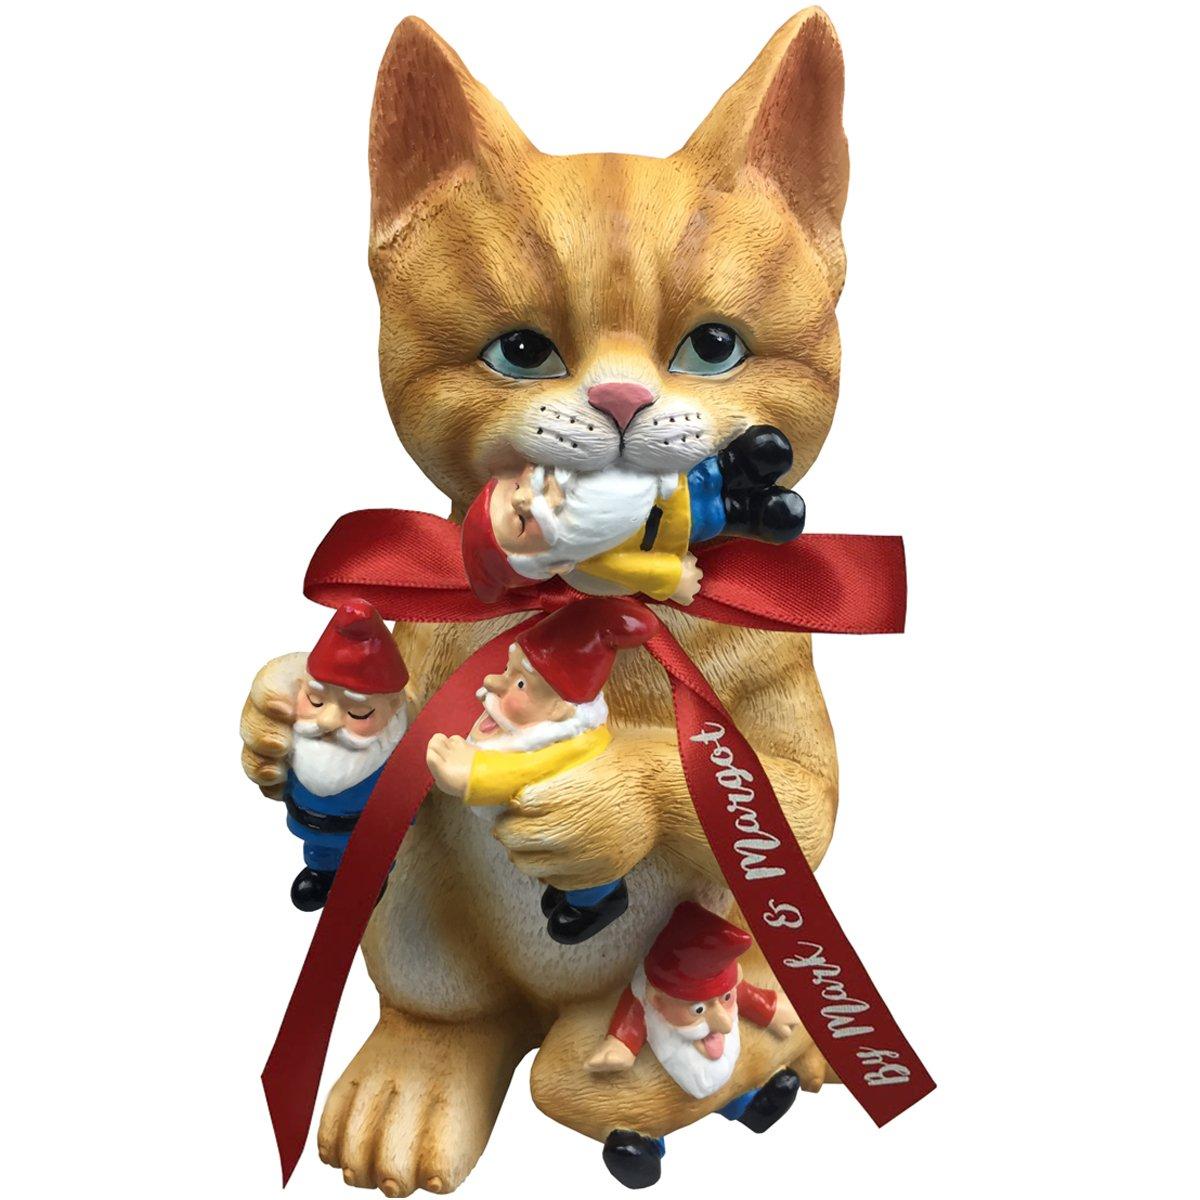 by Mark & Margot - Mischievous Cat Garden Gnome Statue Figurine - Best Art Décor for Indoor Outdoor Home Or Office (Orange)